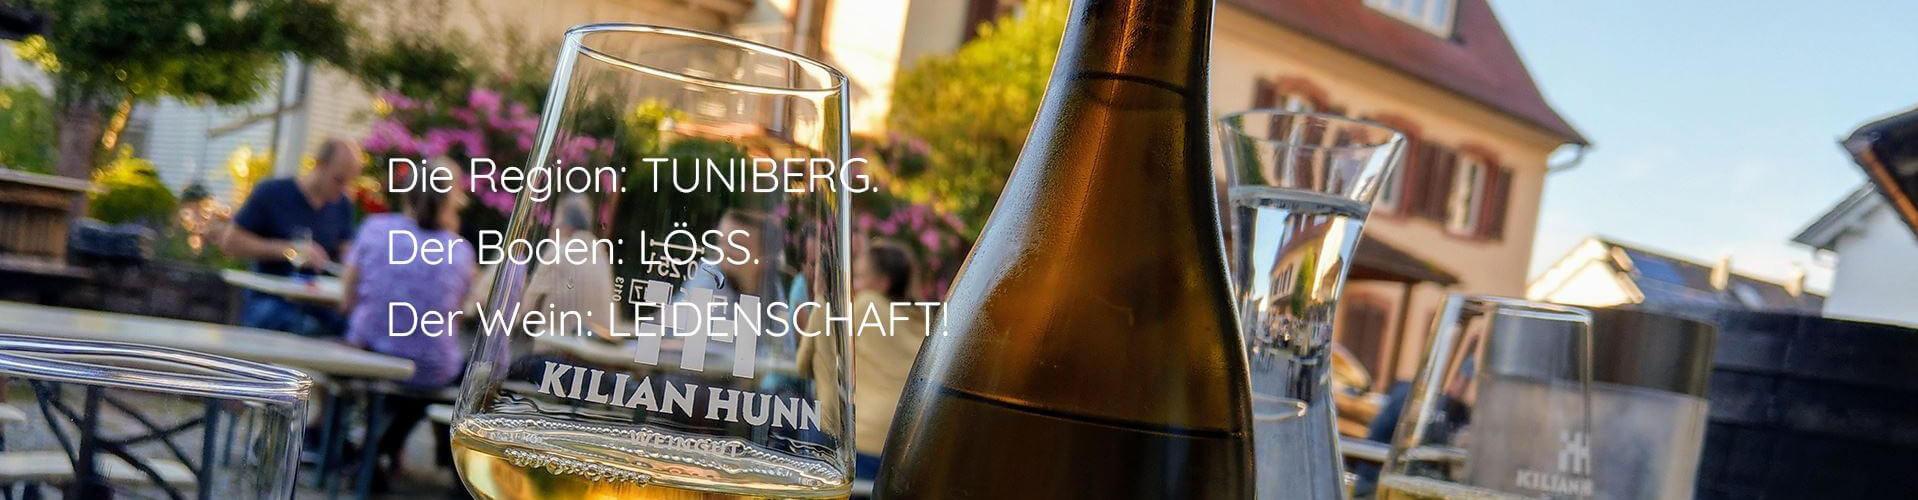 Gottenheimer Wein